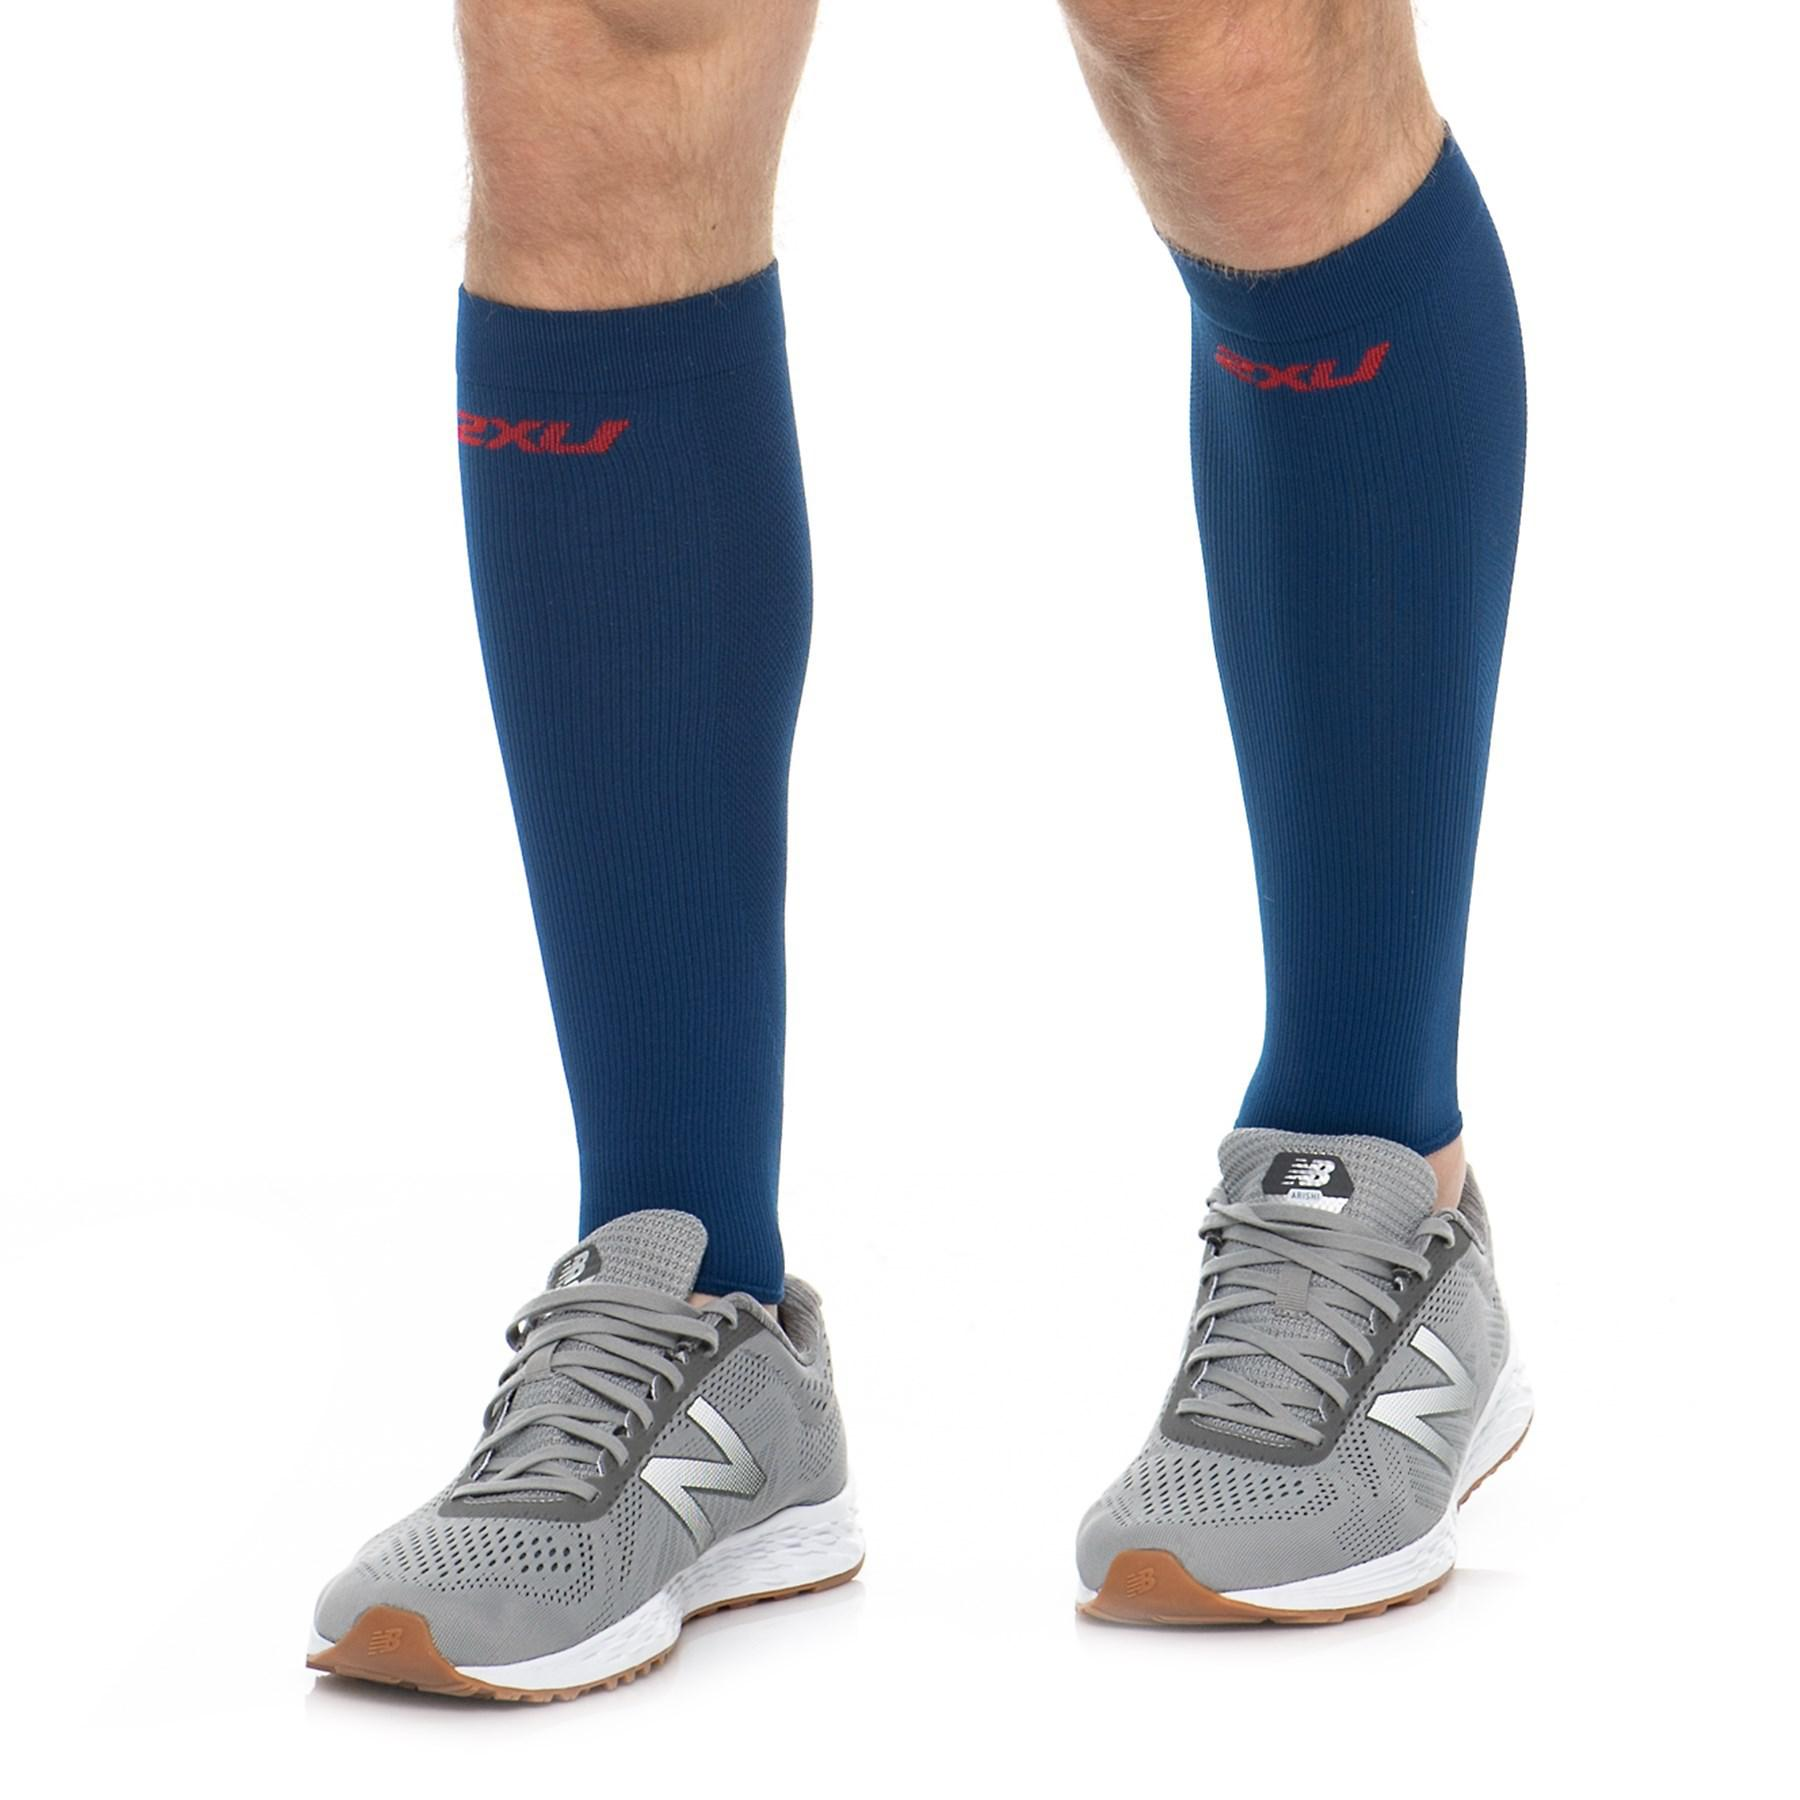 059e88d496 2XU High-performance Run Calf Sleeves in Blue for Men - Lyst